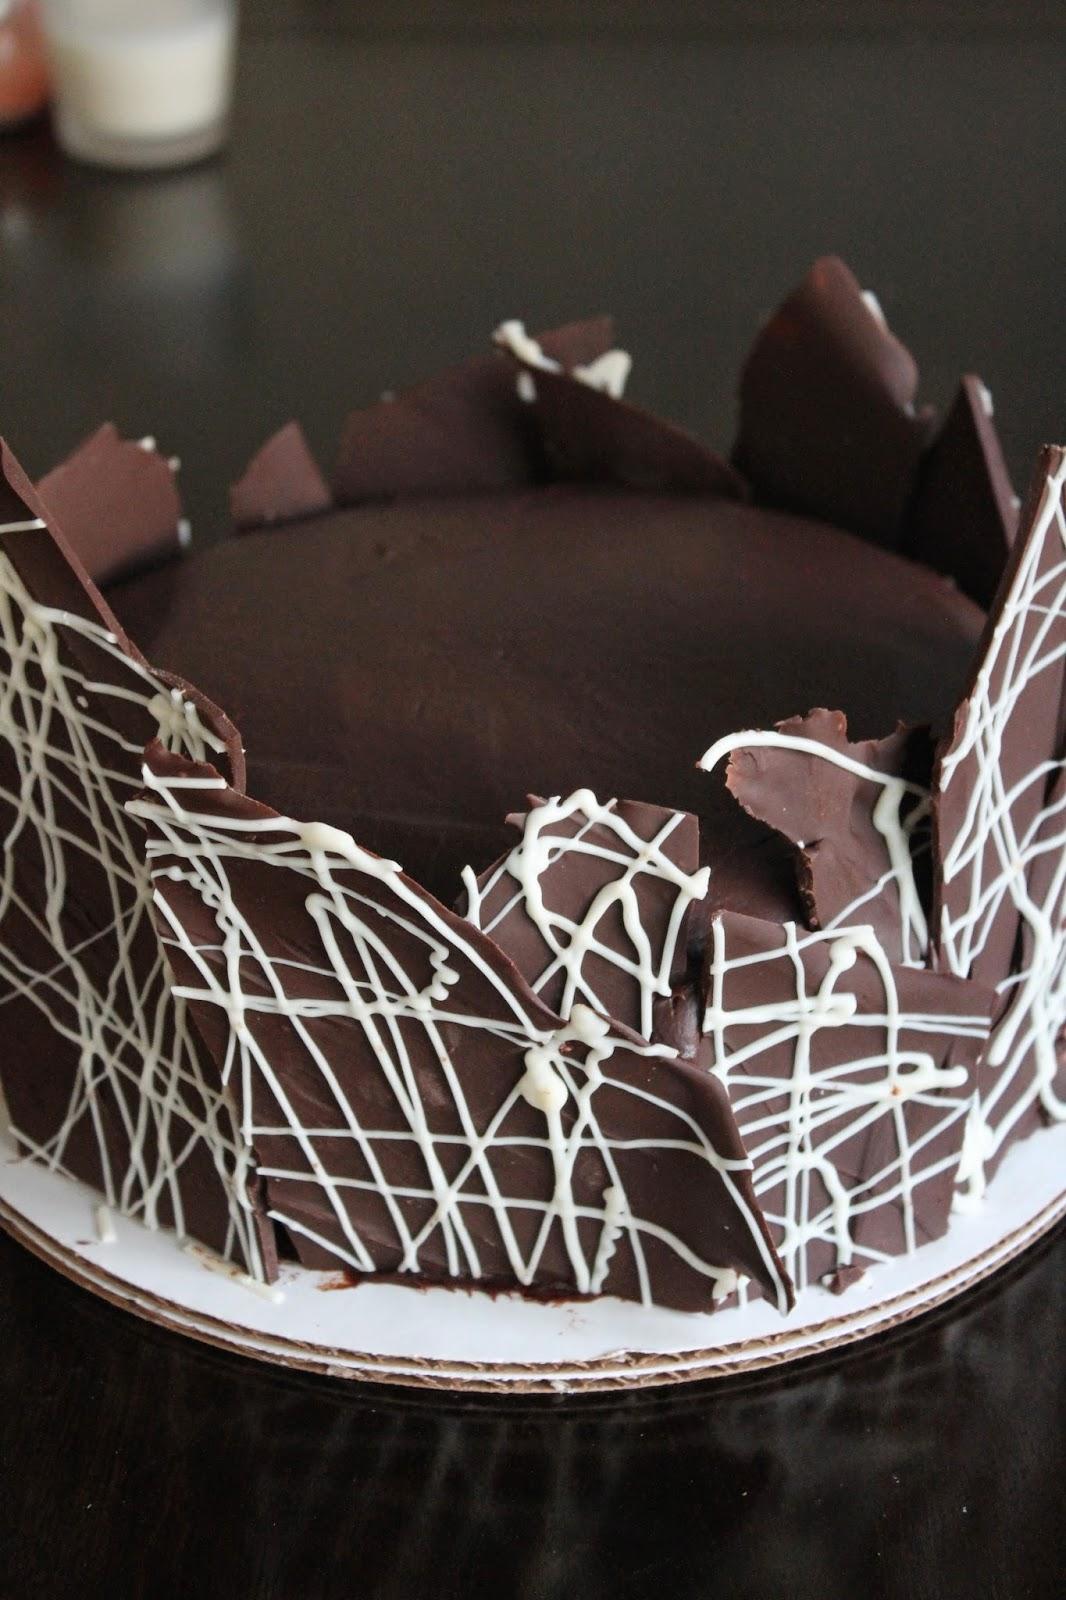 The Cultural Dish Ultra Chocolate Ganache Layer Cake